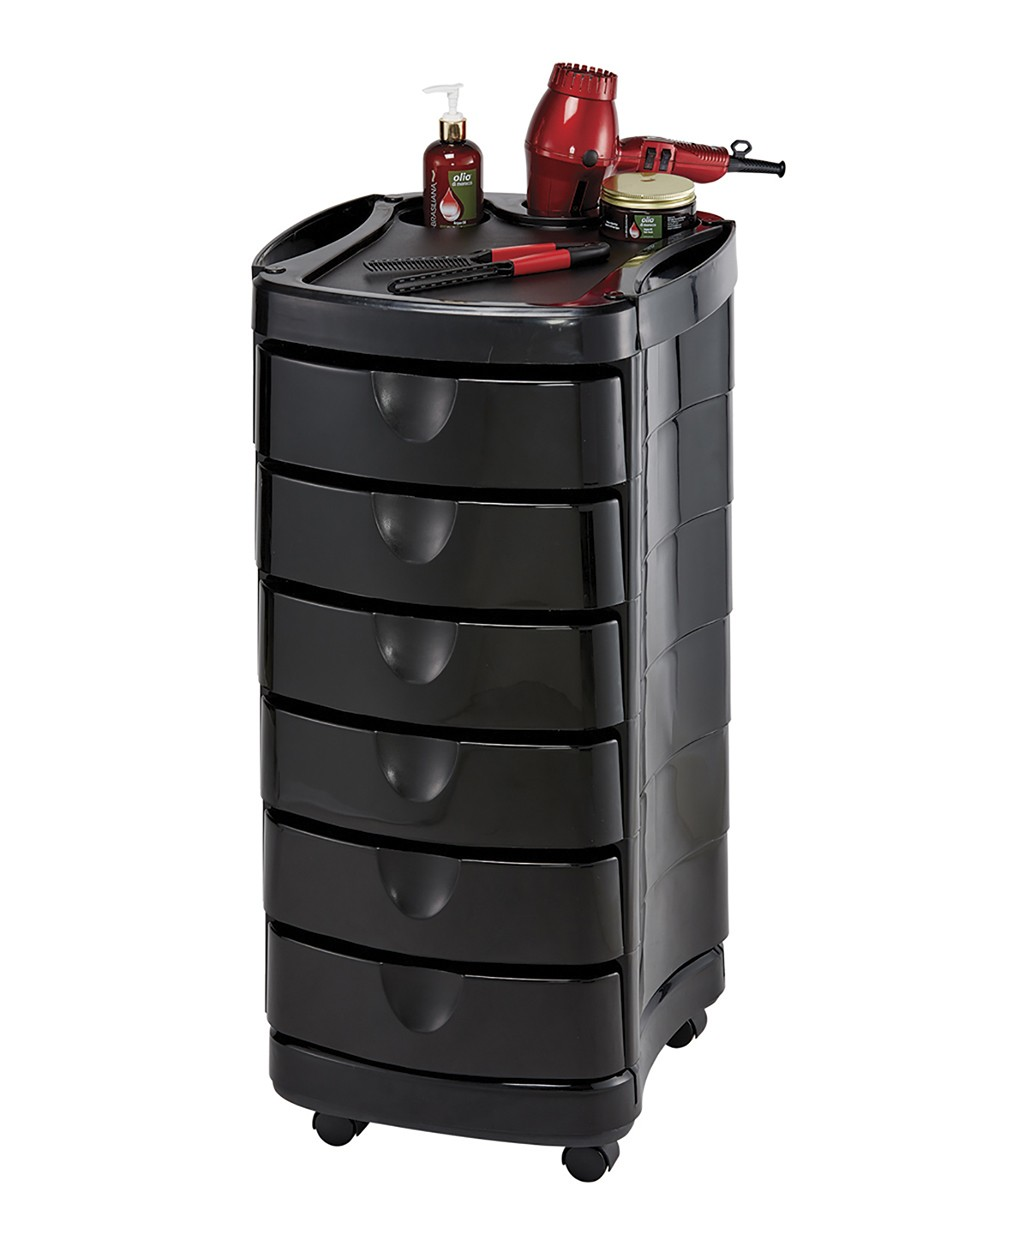 Pibbs 2000 Zorro Utility Cart